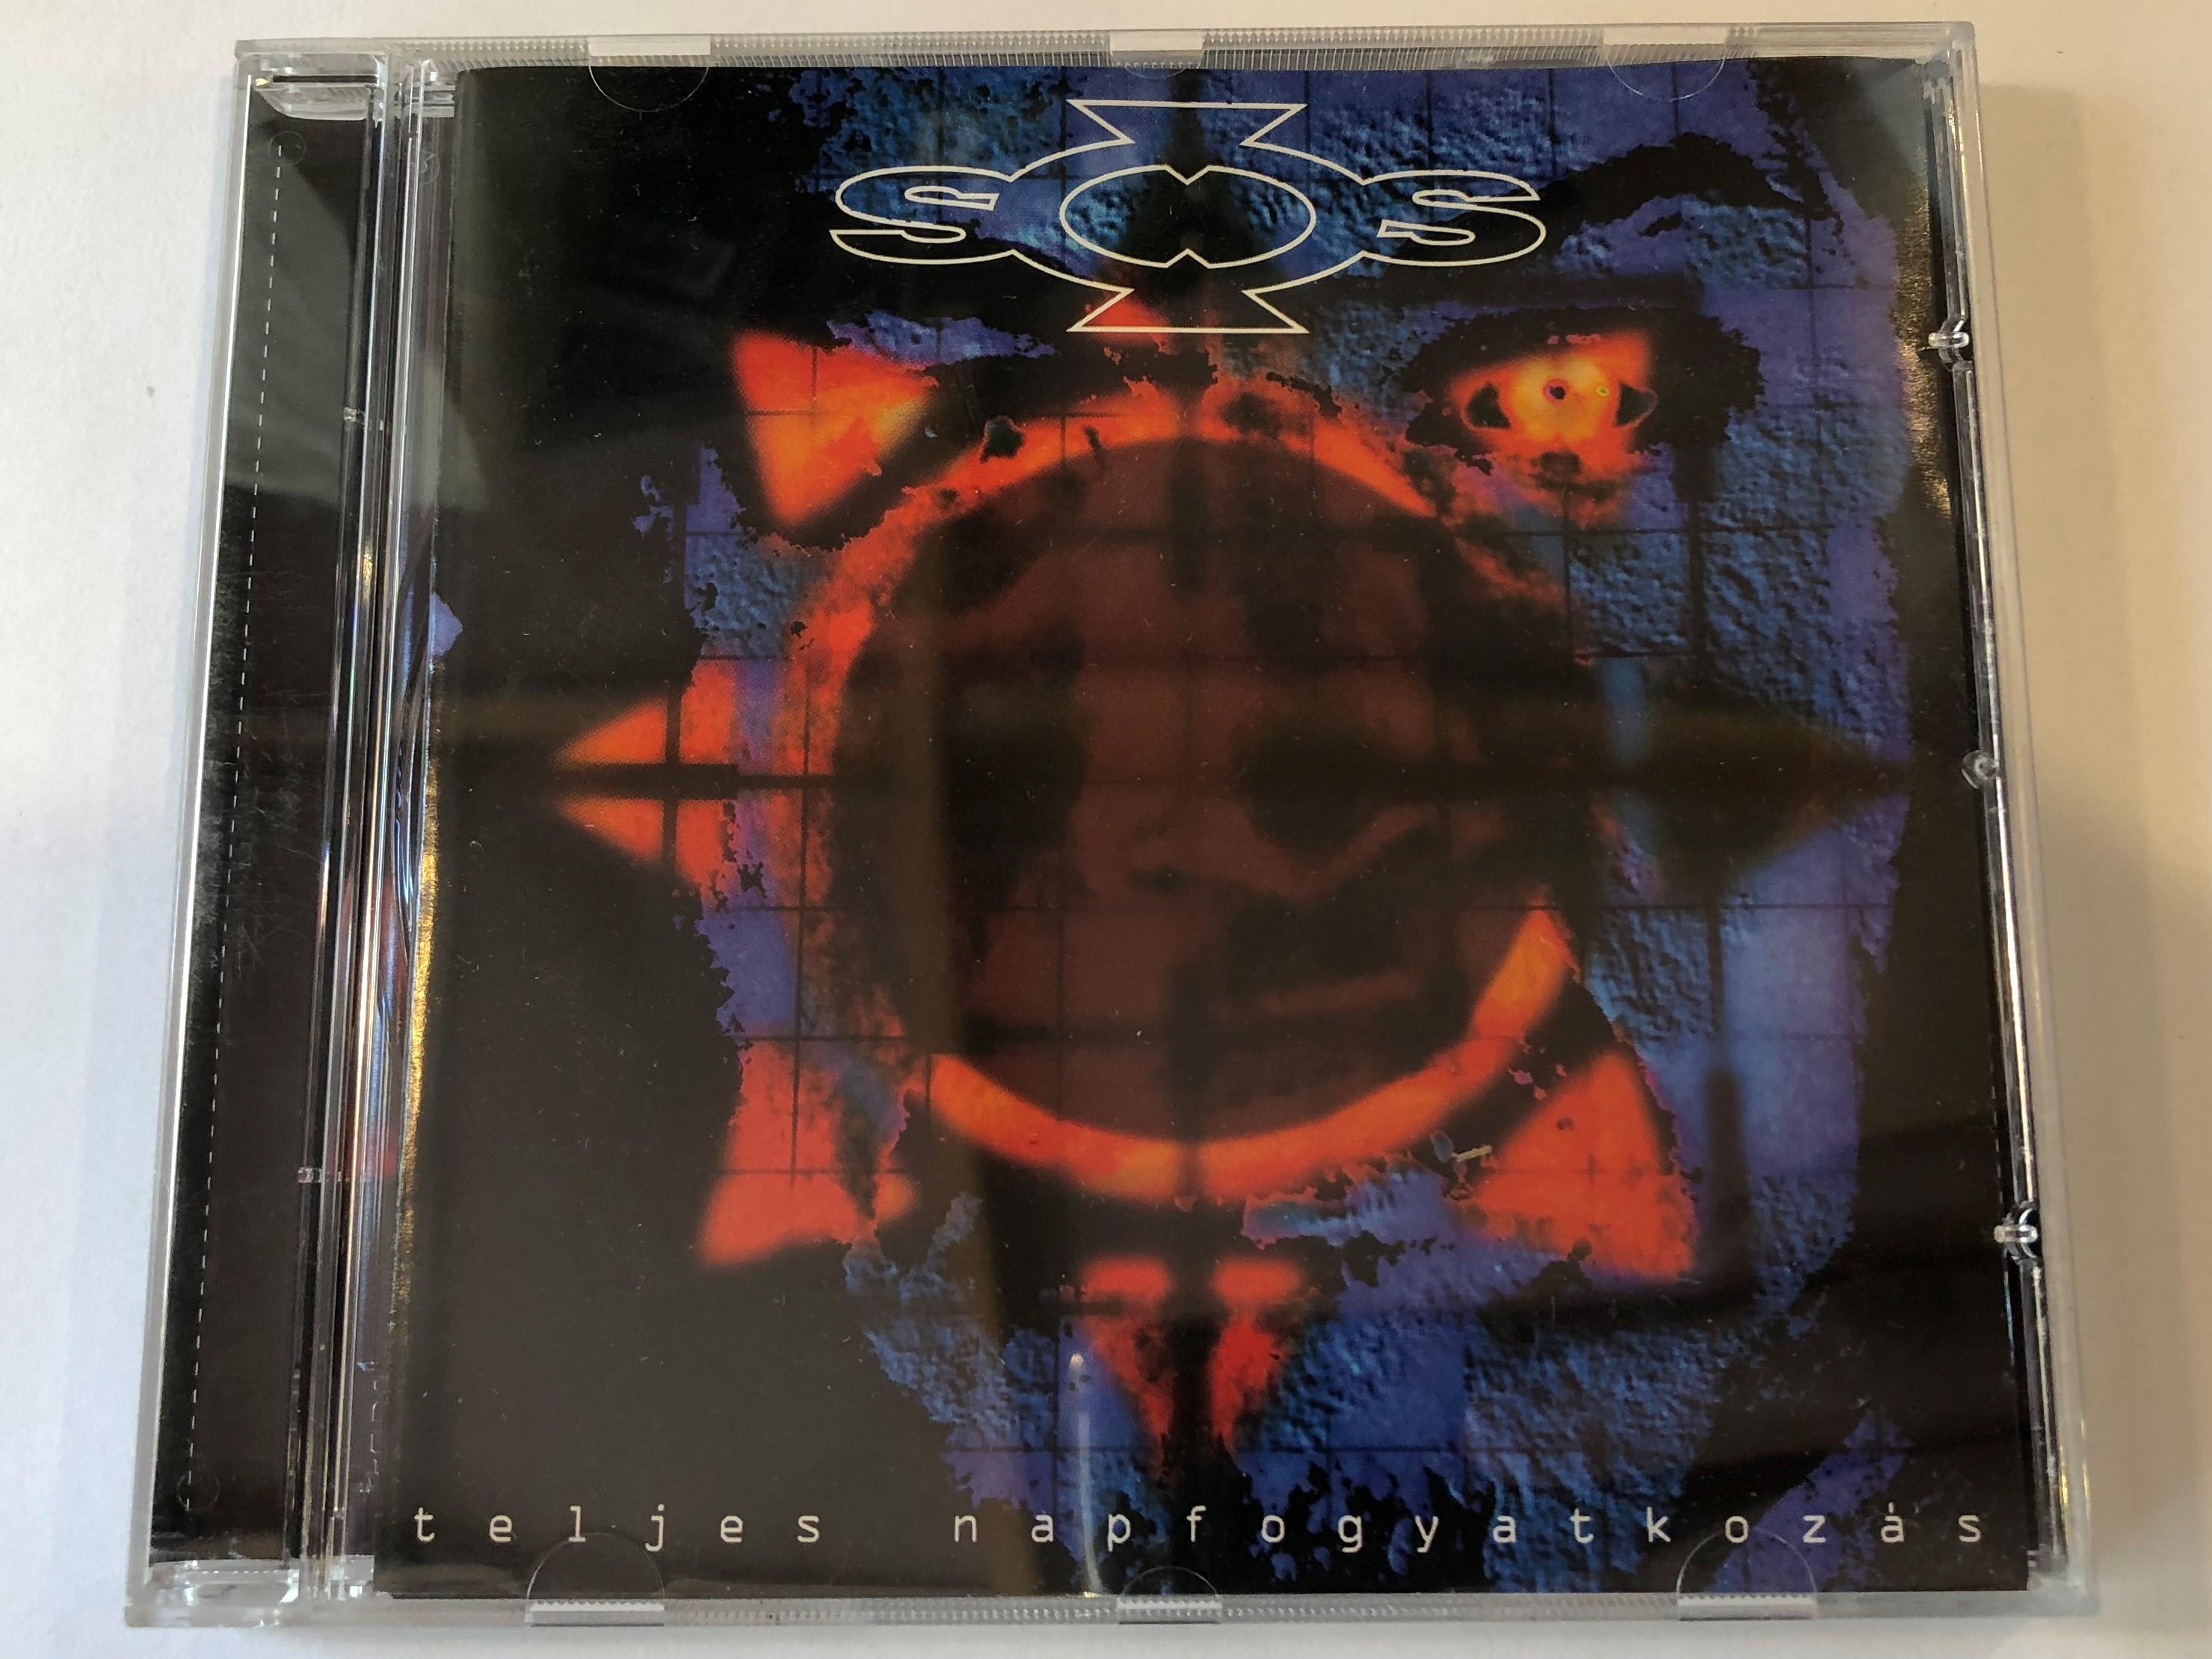 s.o.s.-teljes-napfogyatkoz-s-audio-cd-sos-001-1-.jpg